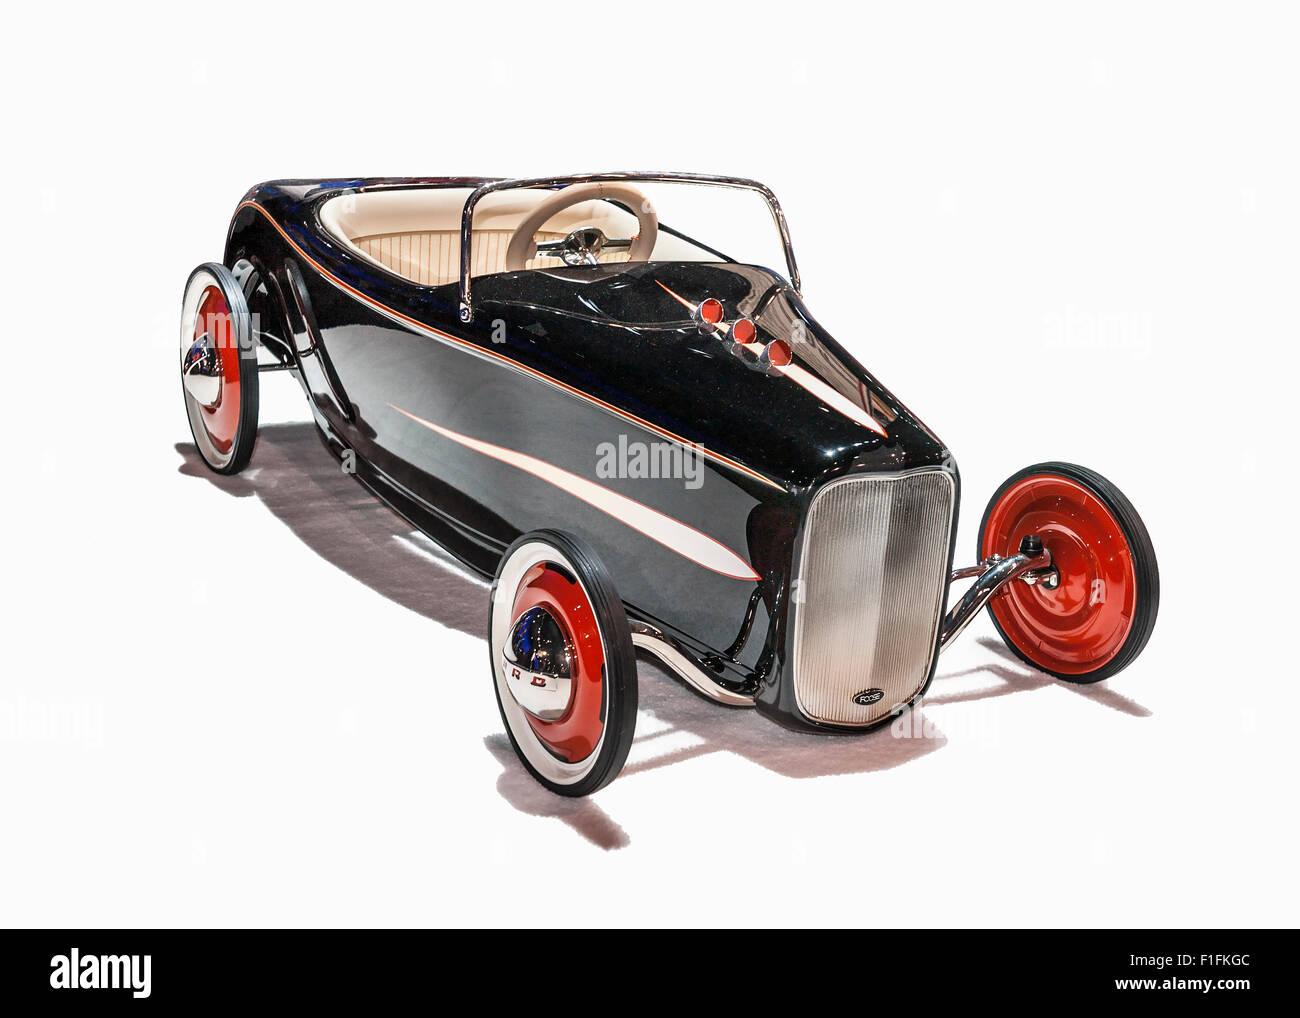 Chip Foose Pedal Car For Sale